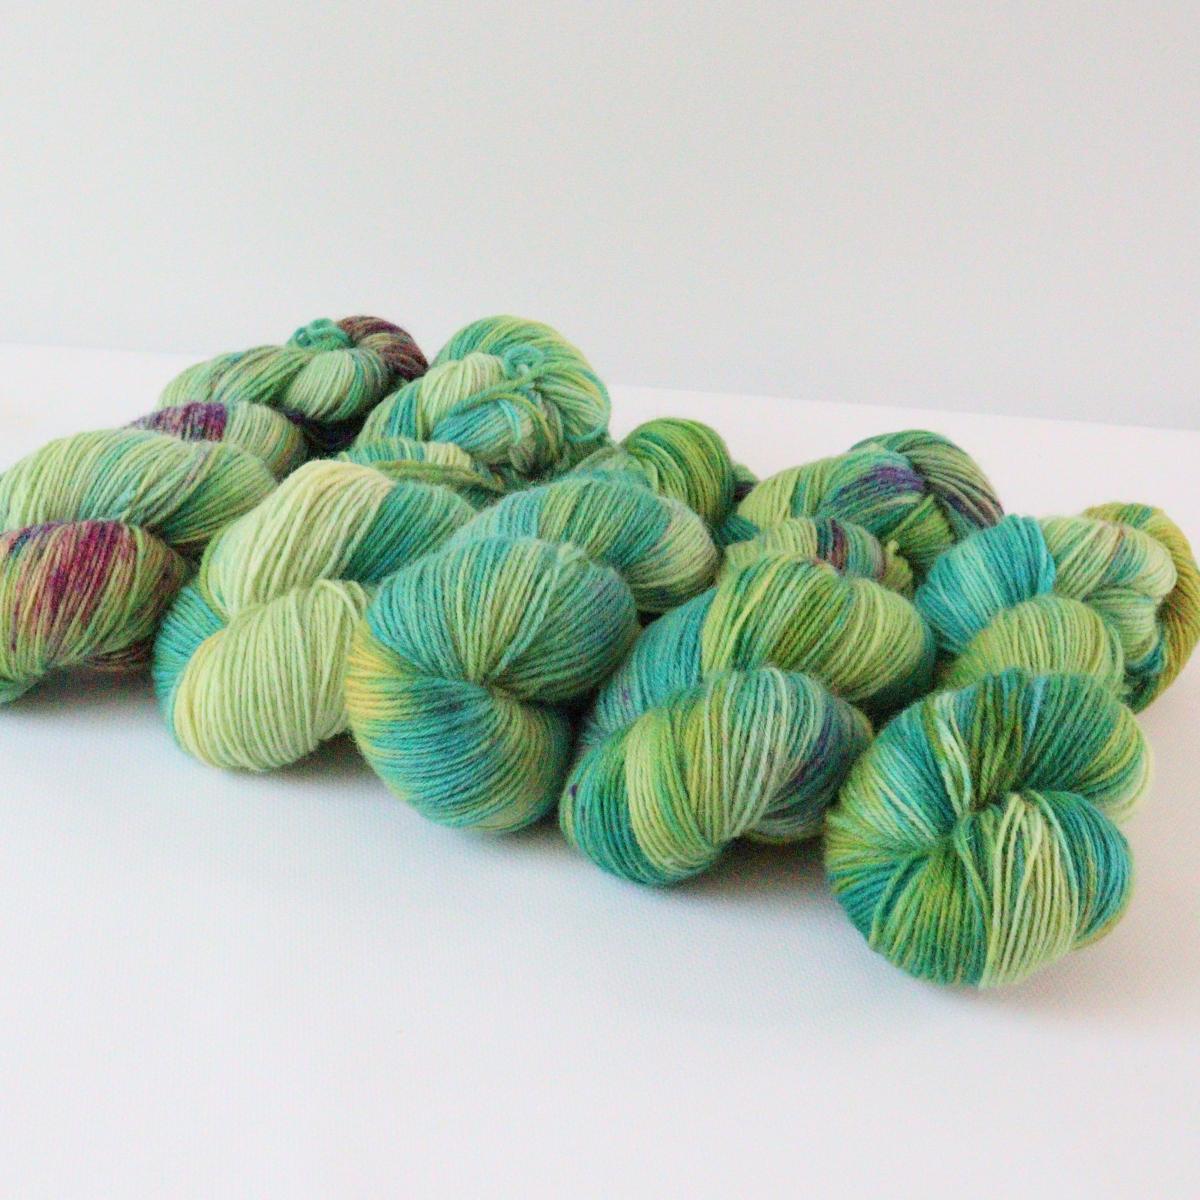 woodico.pro hand dyed yarn 080 4 1200x1200 - Hand dyed yarn / 080